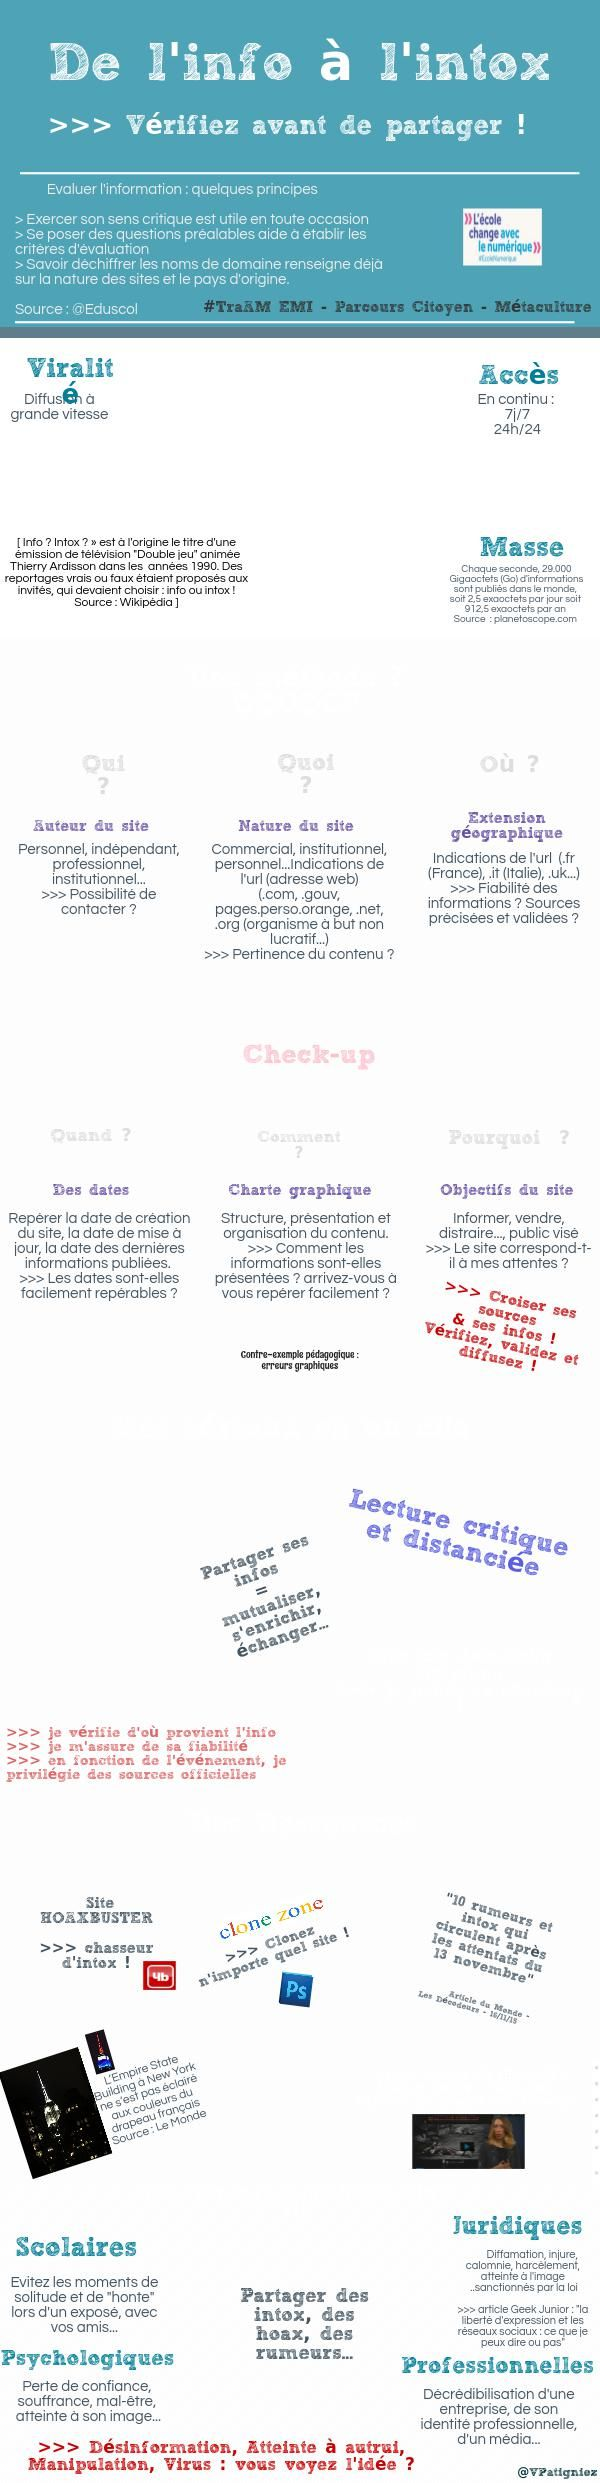 De l'info à l'intox | Piktochart Infographic Editor